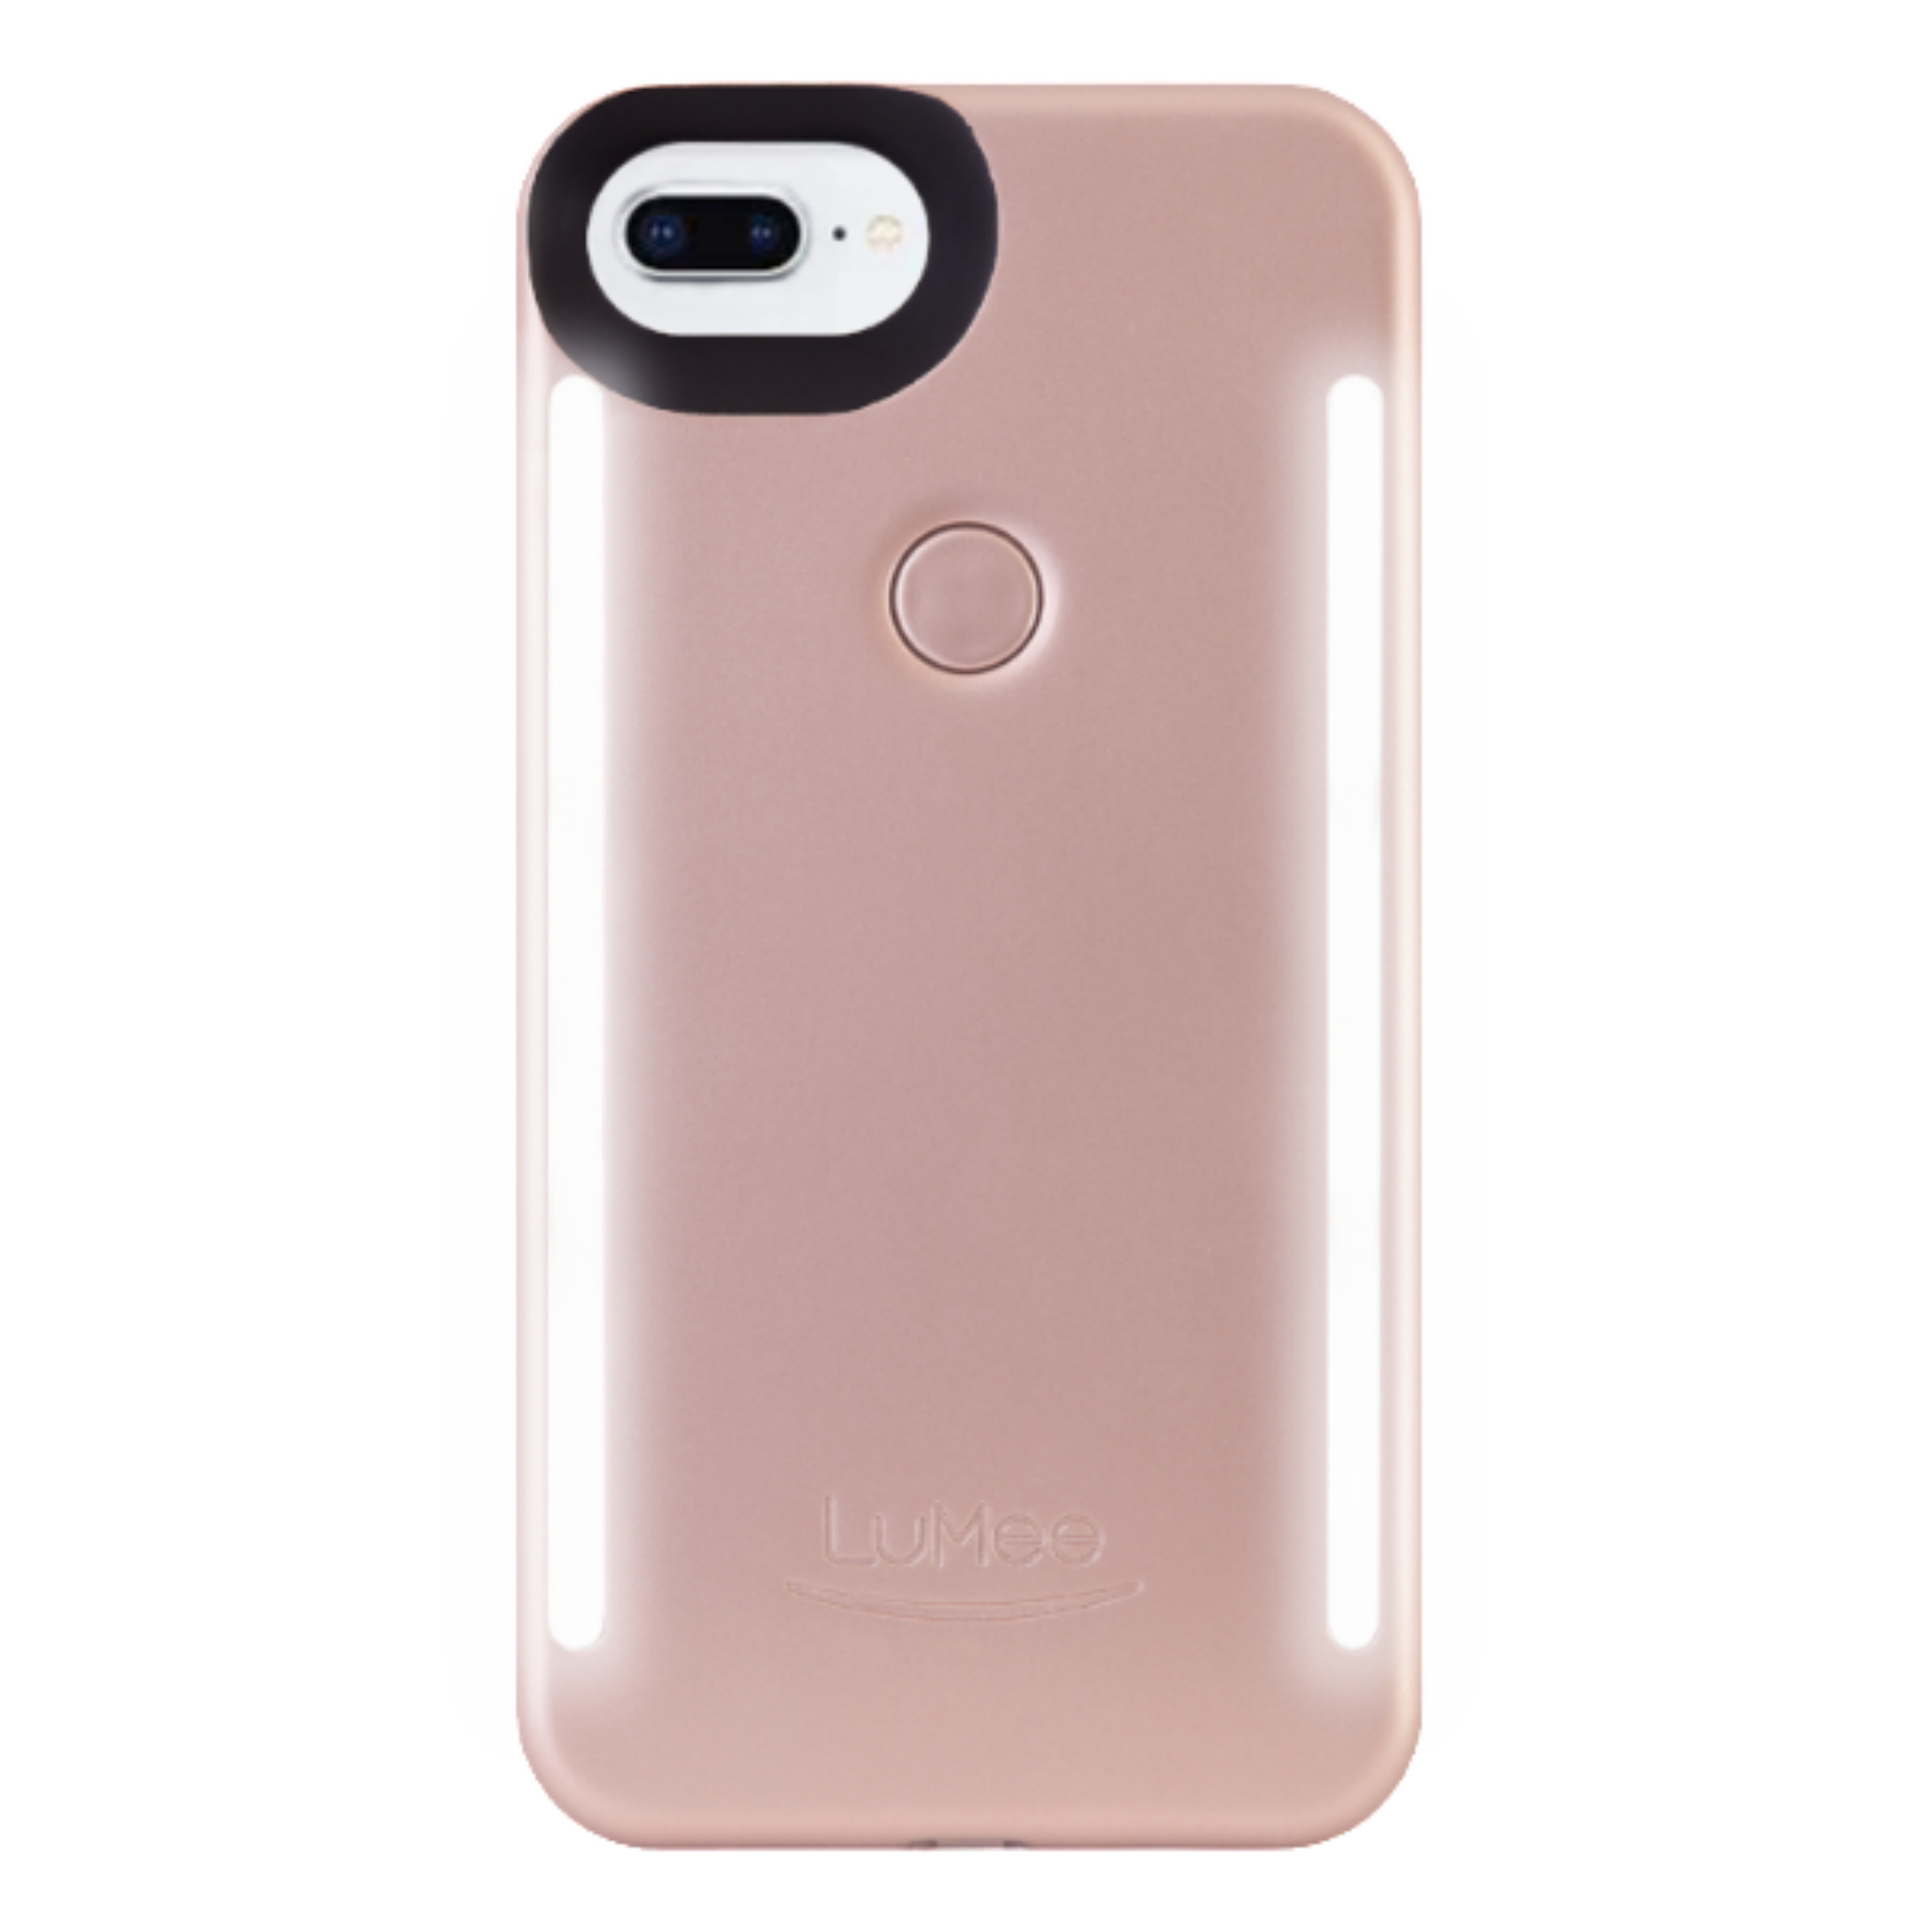 LuMee Duo LED Phone Selfie Case For iPhone 6/6S/7/8 Plus|Soft-Slim-Sleek|Matte Rose